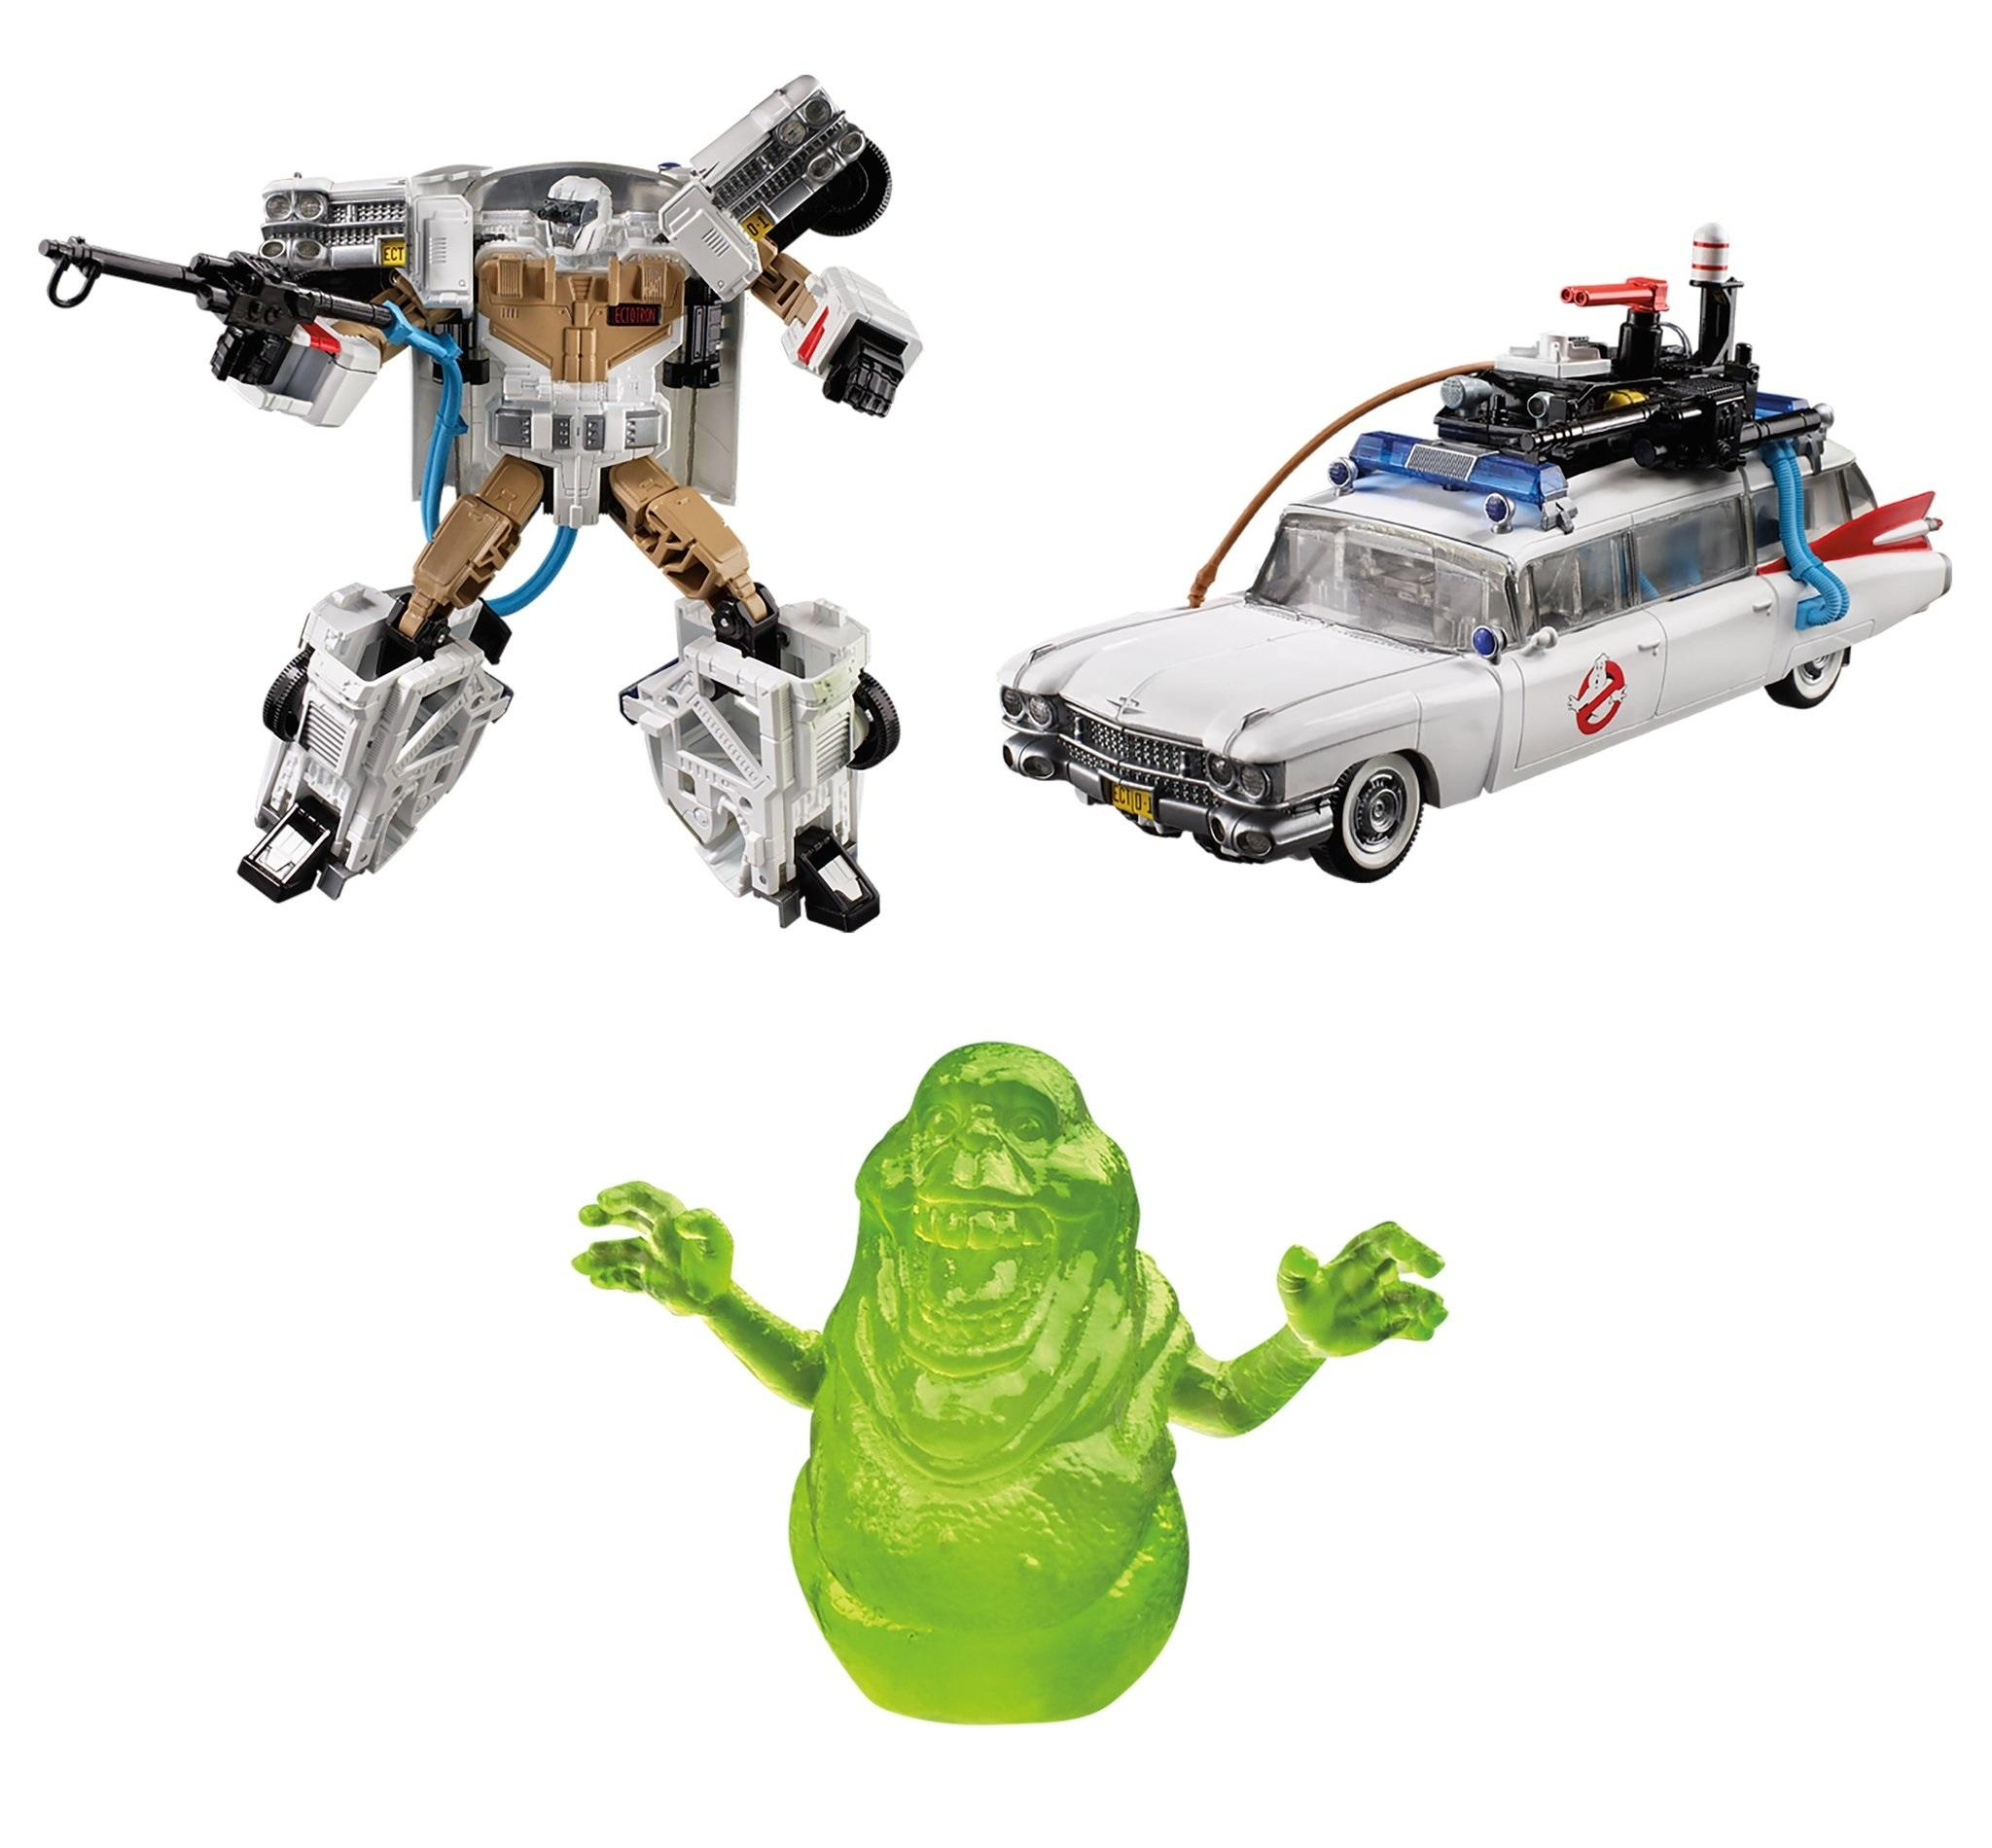 Transformers x Ghostbuster: ECTO-1 Ectotron by Hasbro